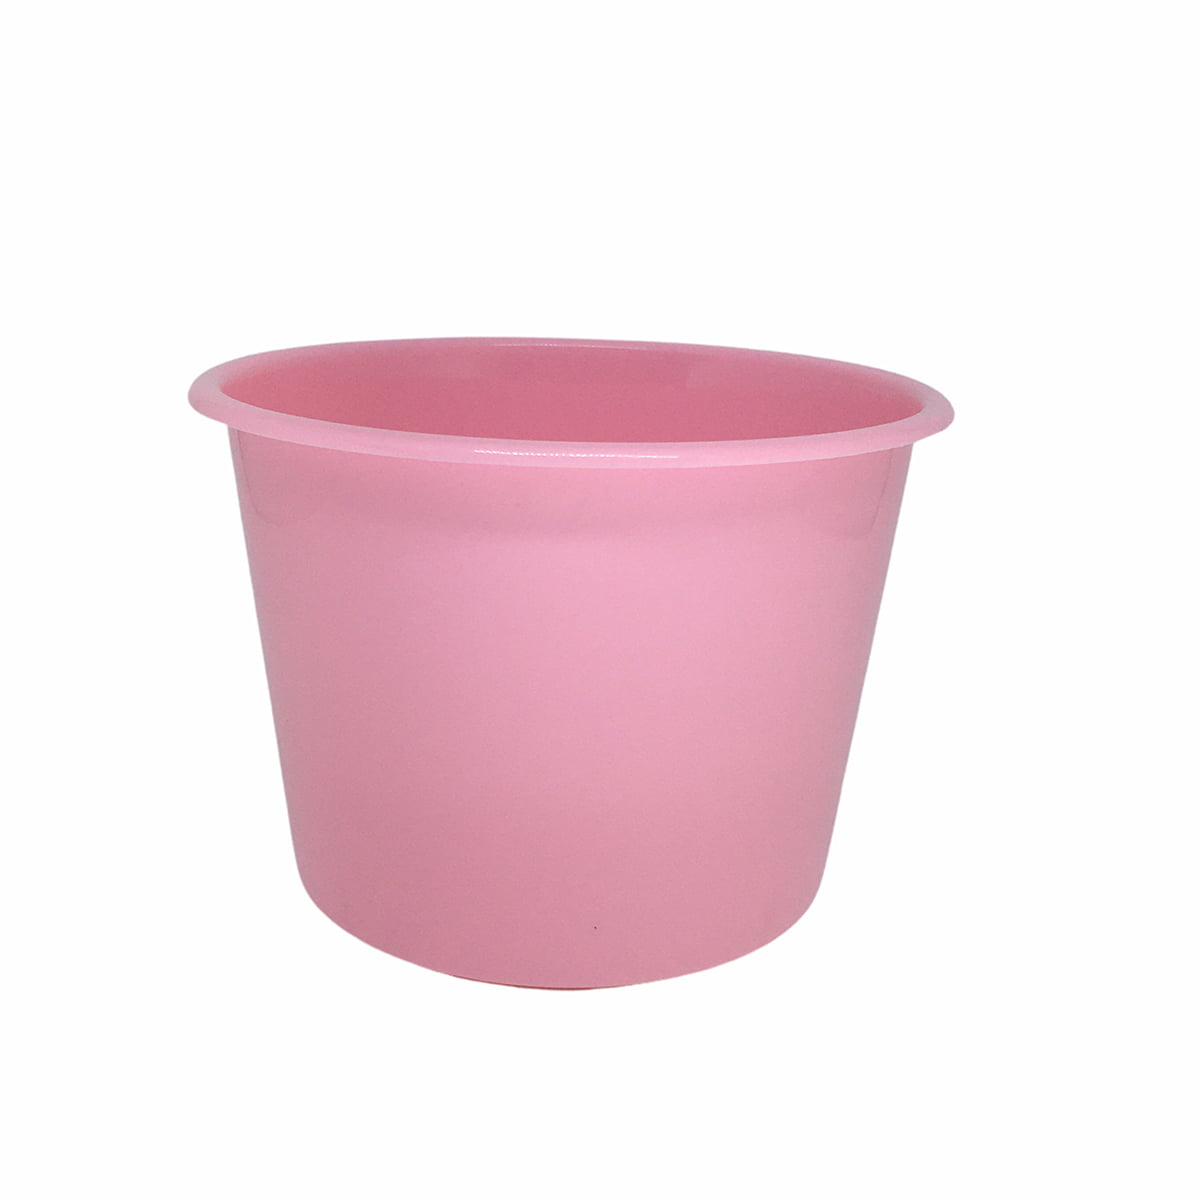 Balde de Pipoca Grande 1,5 Litros Rosa Claro